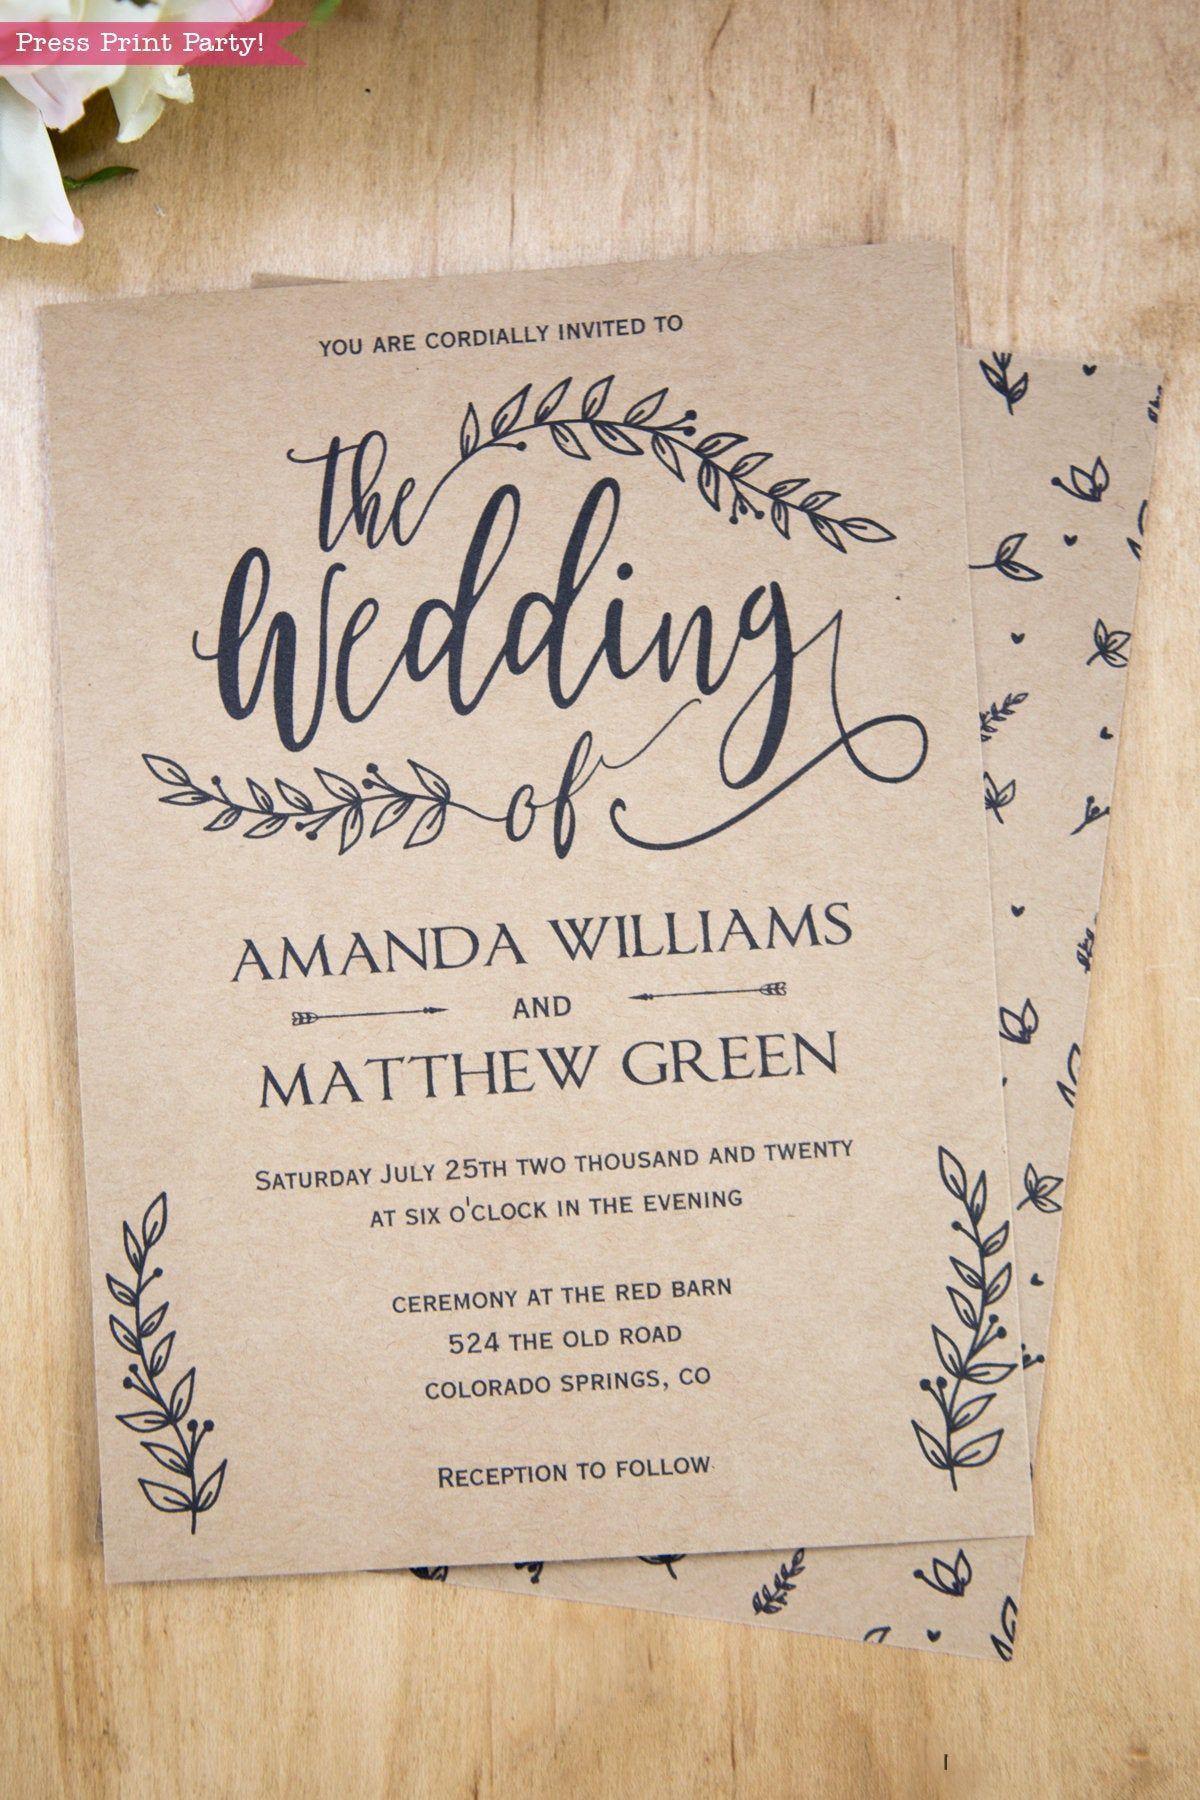 002 Wonderful Rustic Wedding Invitation Template High Def  Templates Free For Word Maker PhotoshopFull